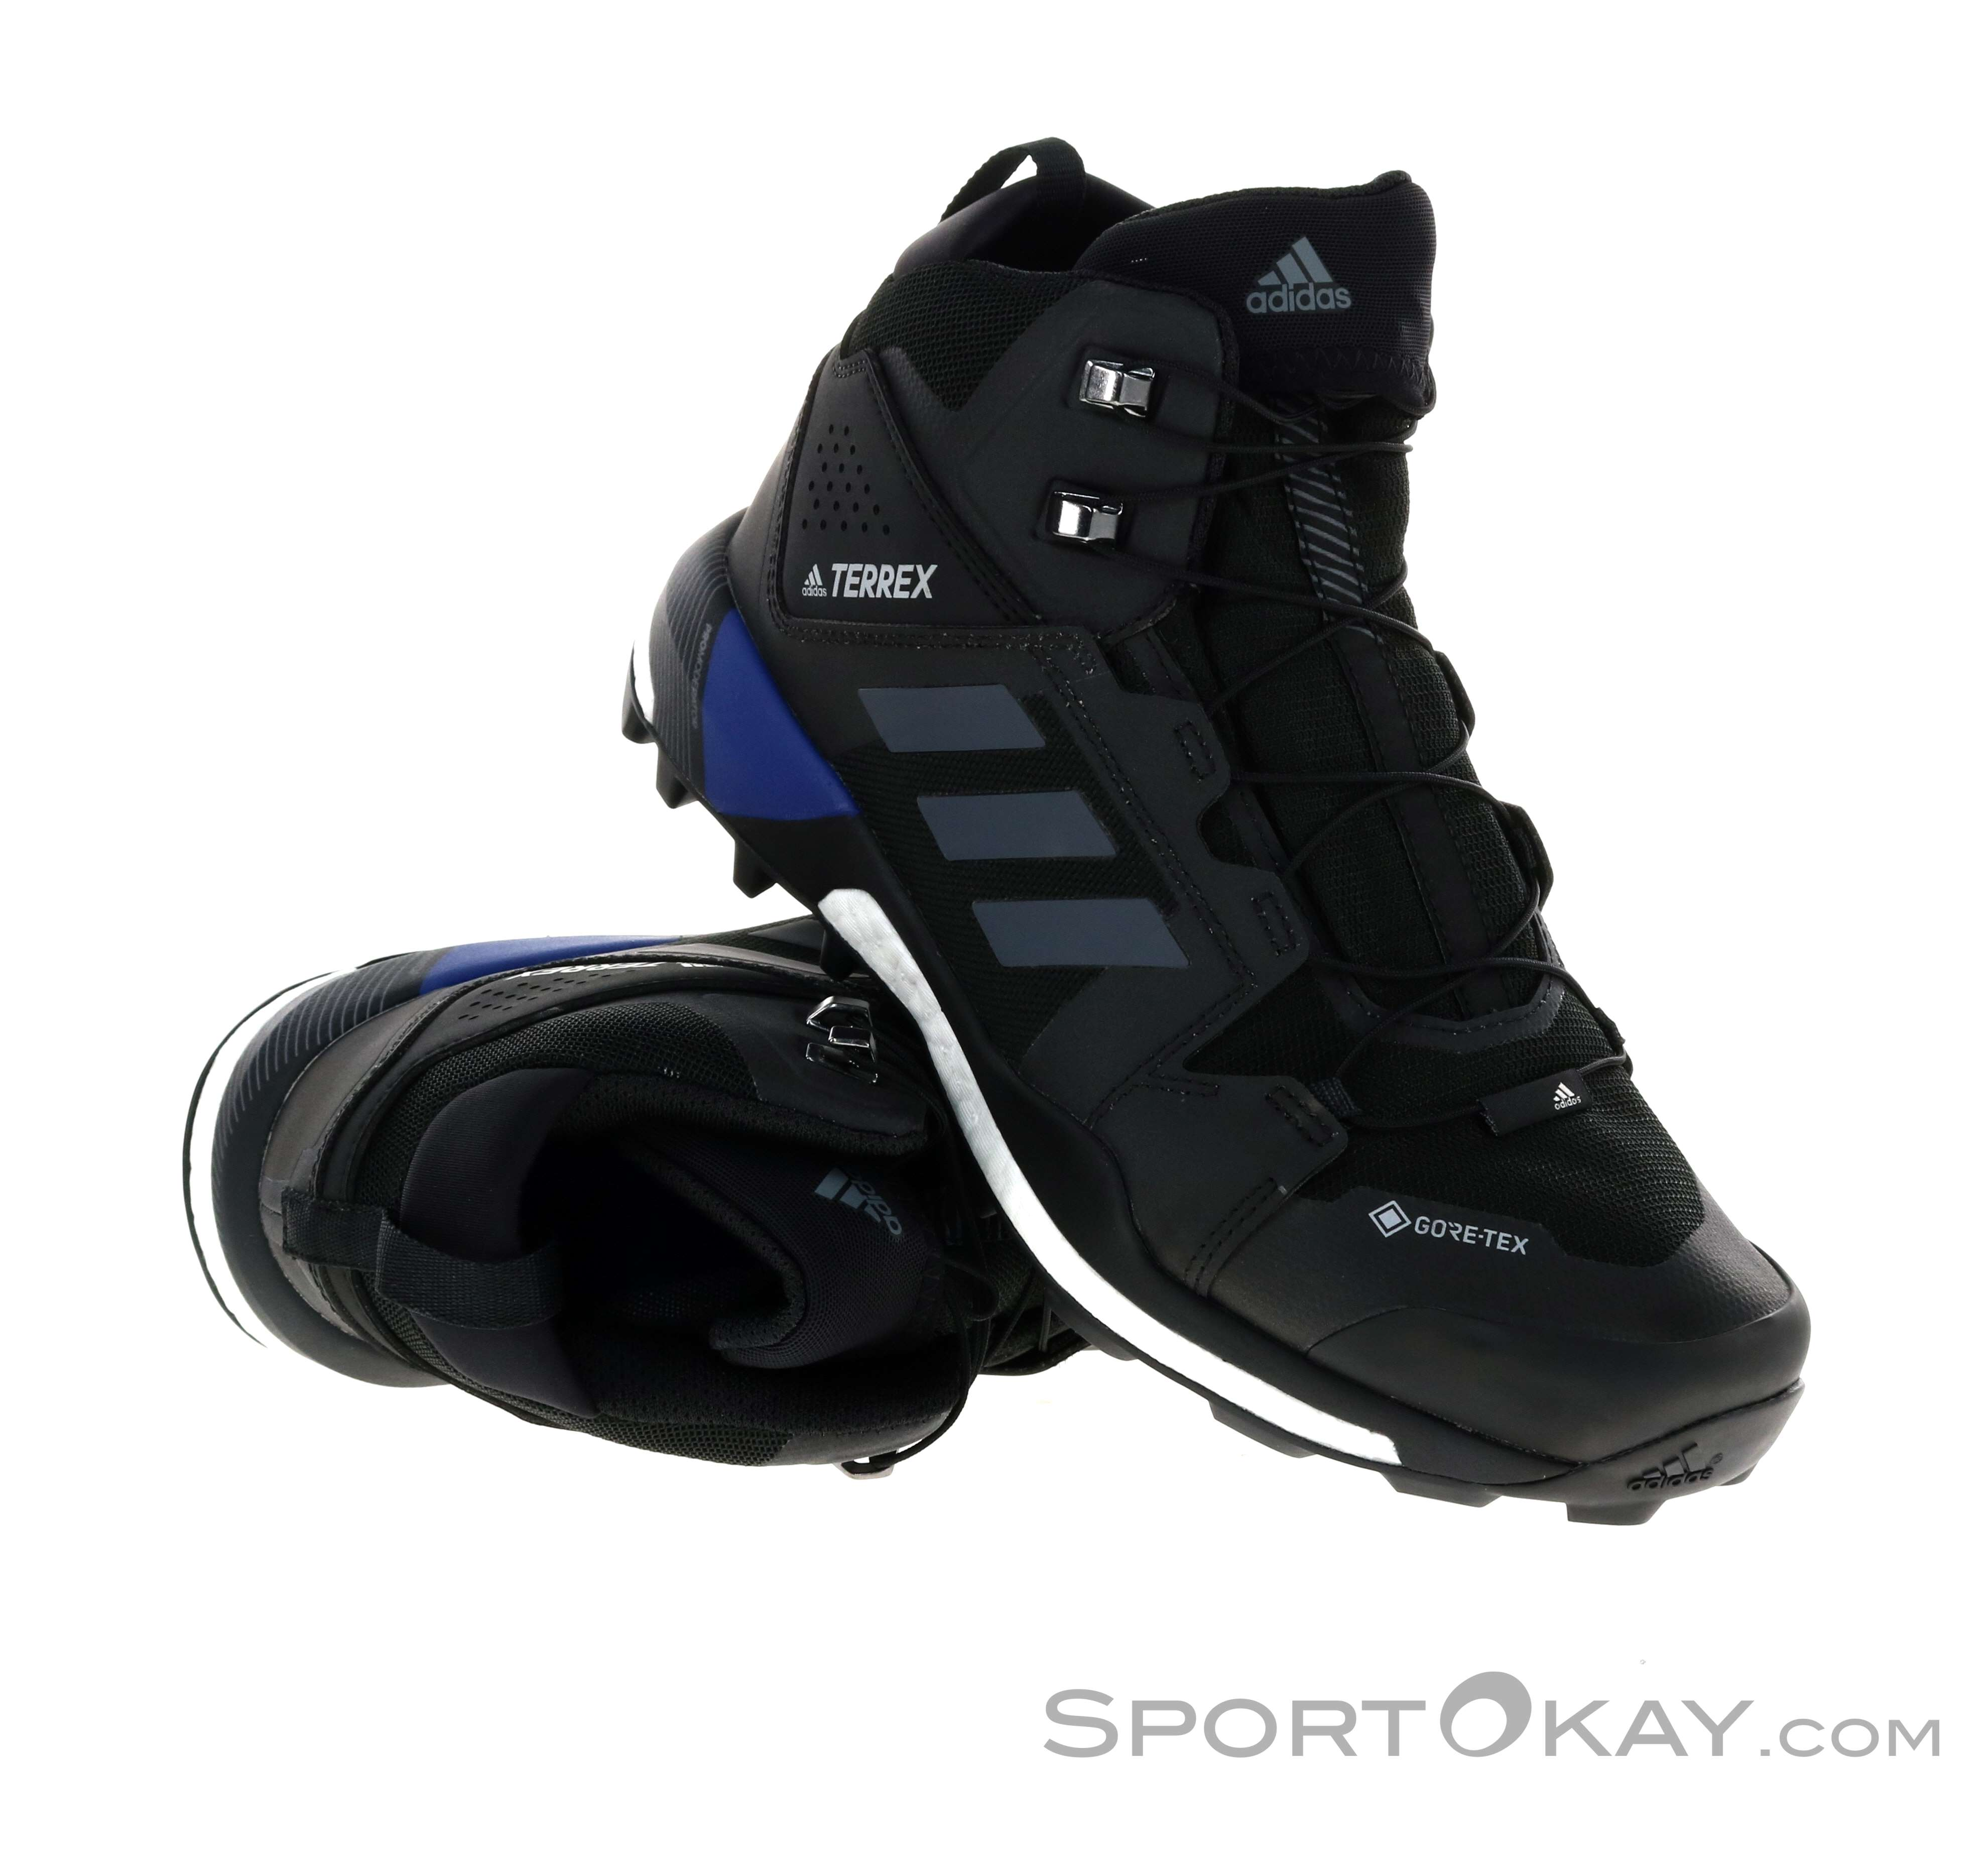 adidas Terrex adidas Terrex Skychaser XT Mens Hiking Boots Gore-Tex